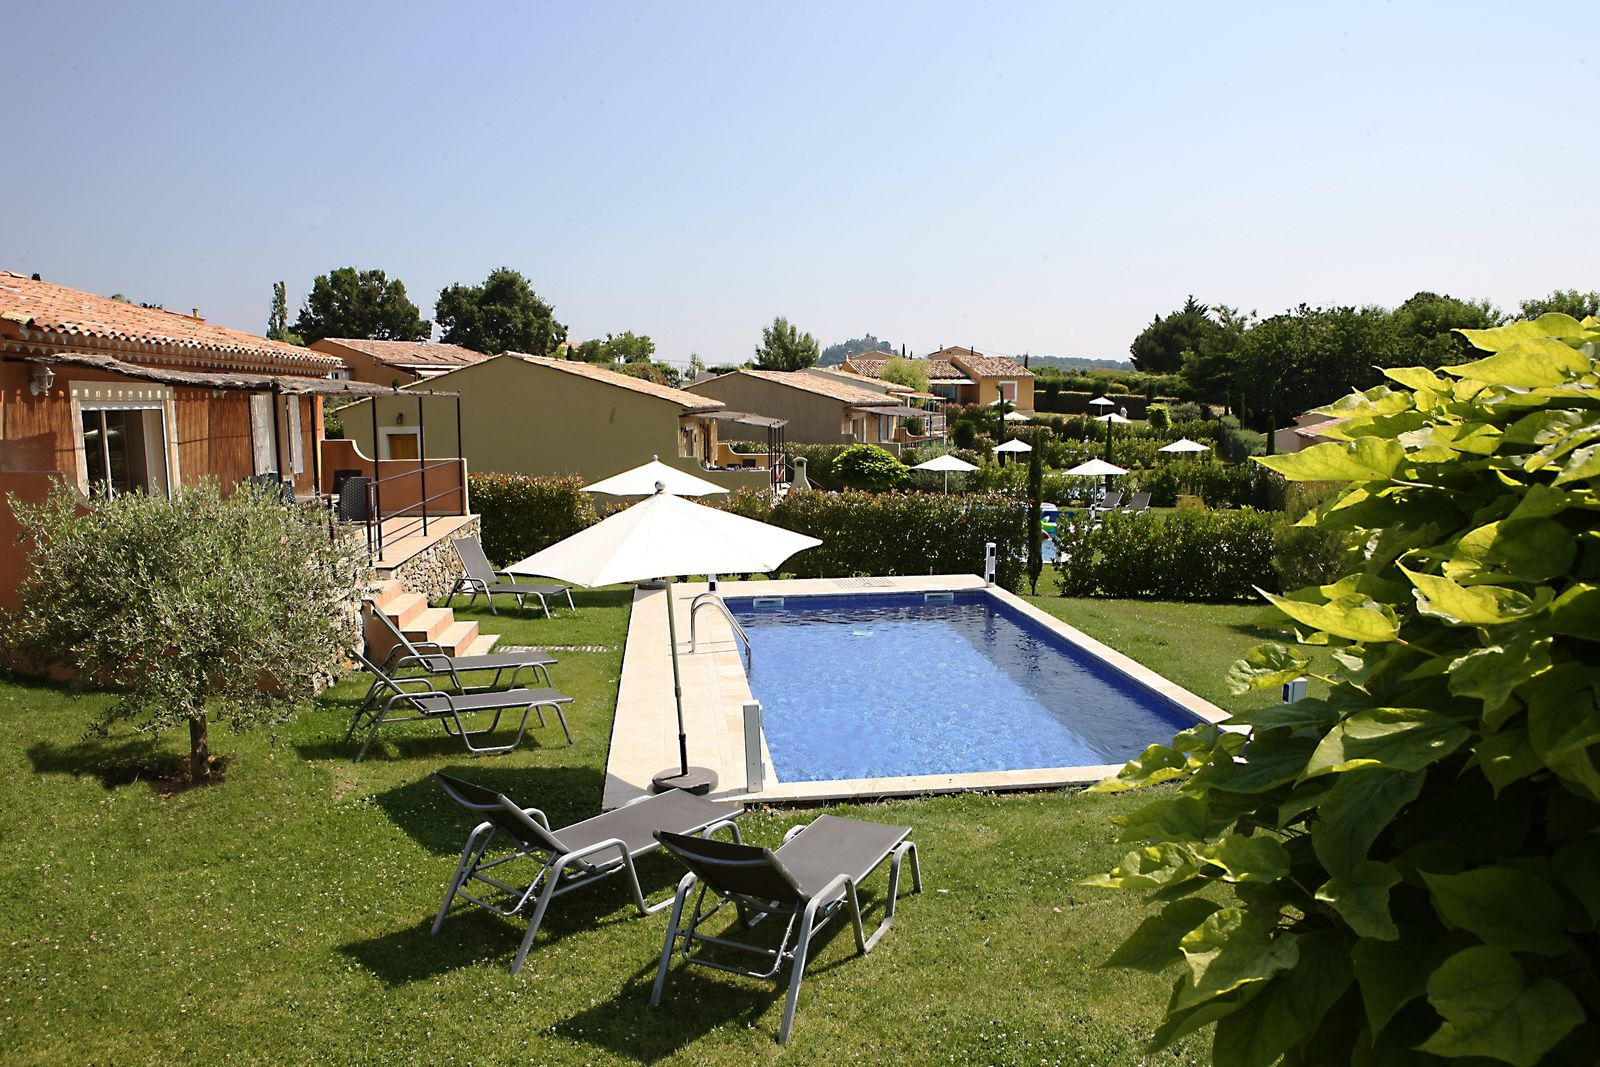 Park beaudine vakantiewoning t3 met prive zwembad in for Vakantiehuisjes met prive zwembad